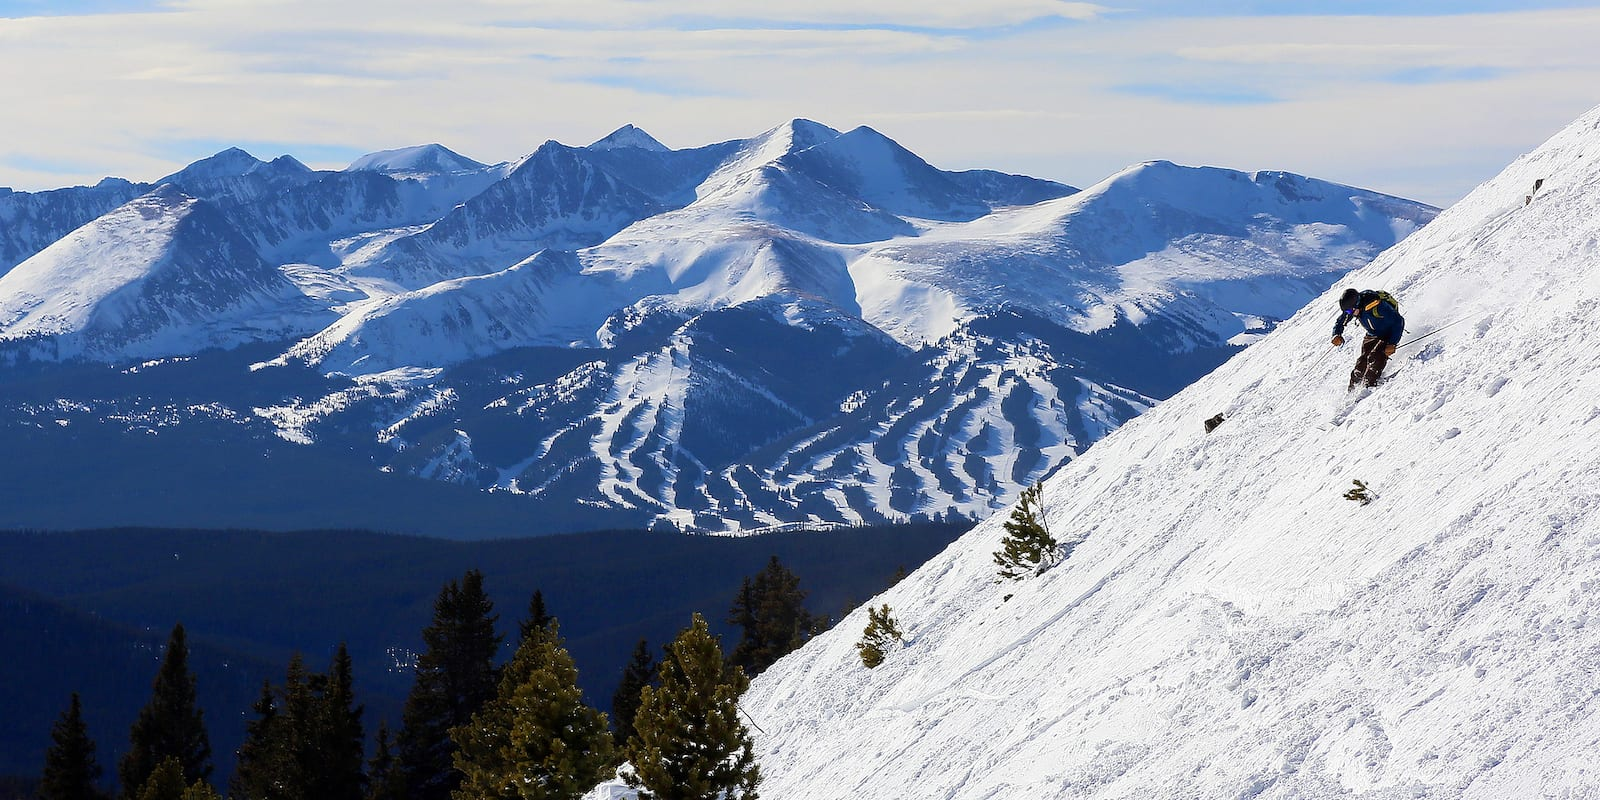 Ski Resorts in Summit County Skiing Keystone with View of Breckenridge